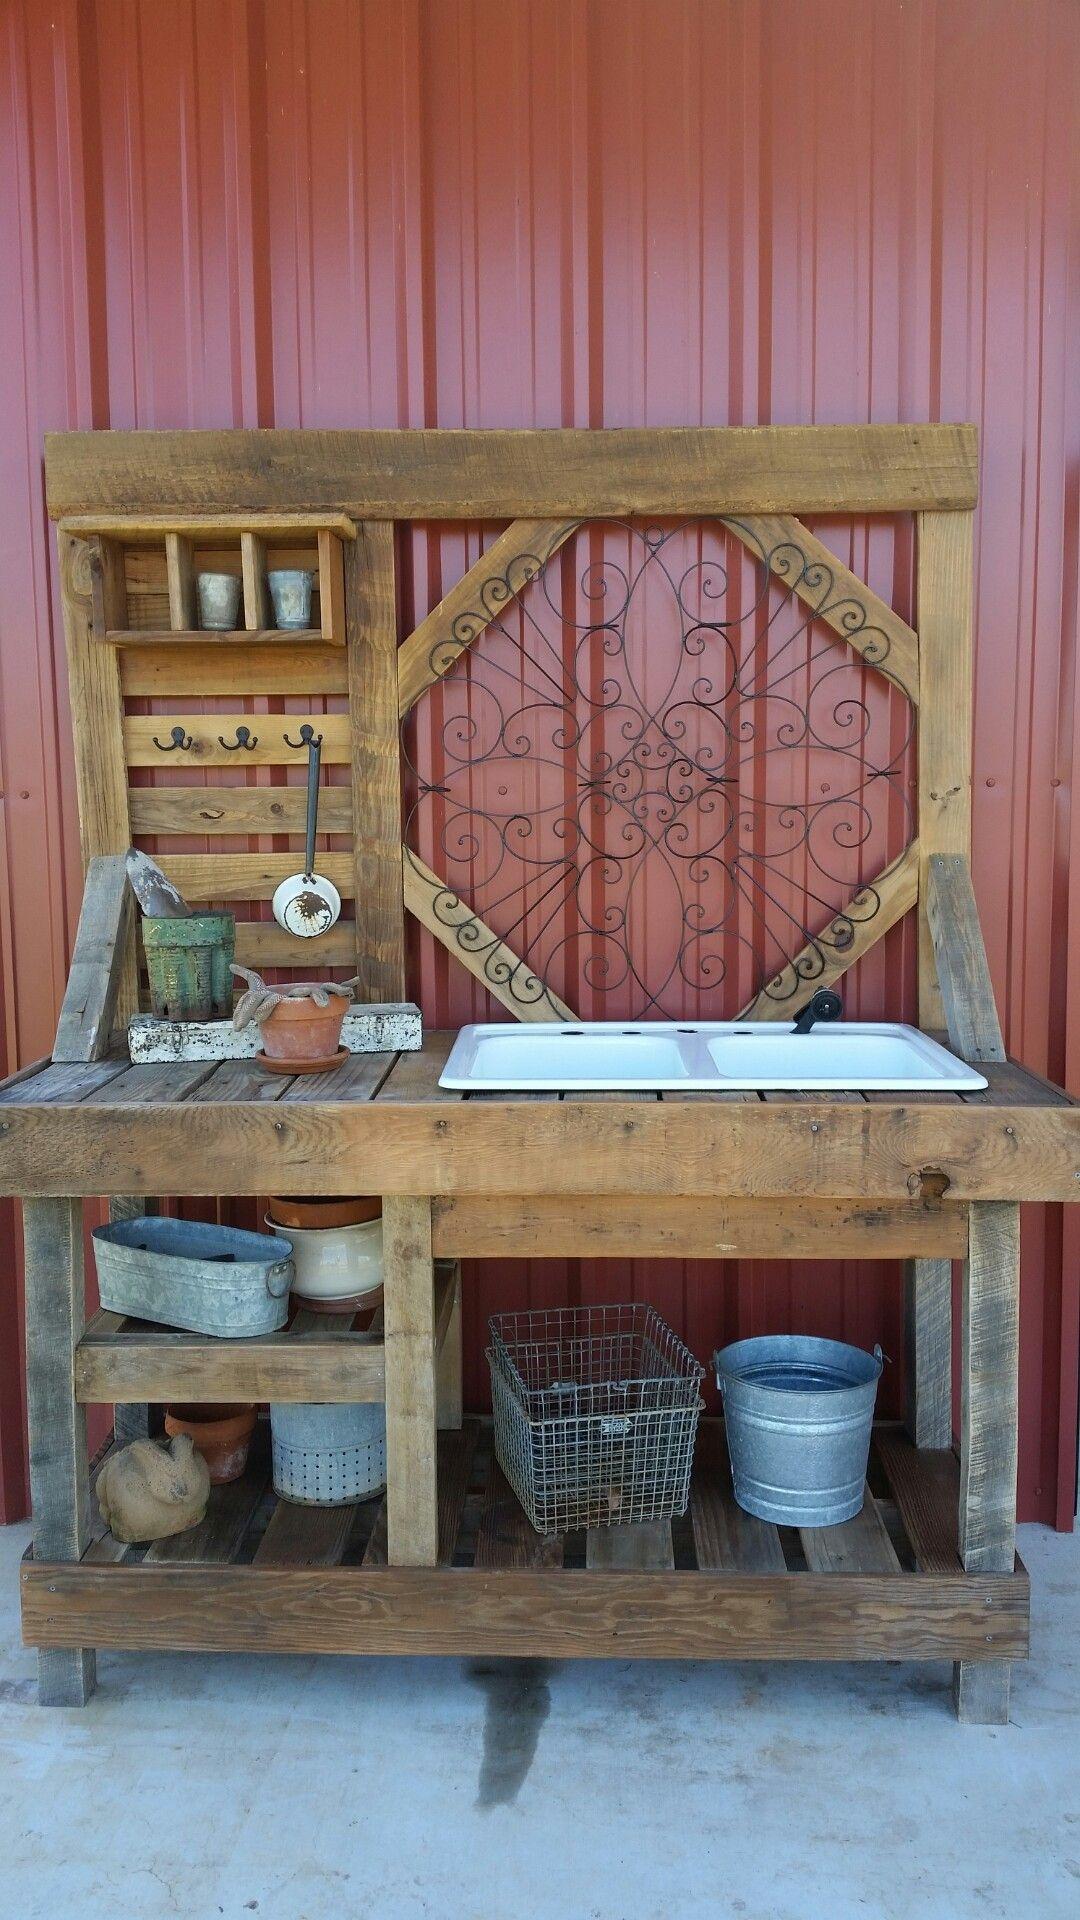 Pallet Potting Bench - Gardening Rustic Outdoor Craft